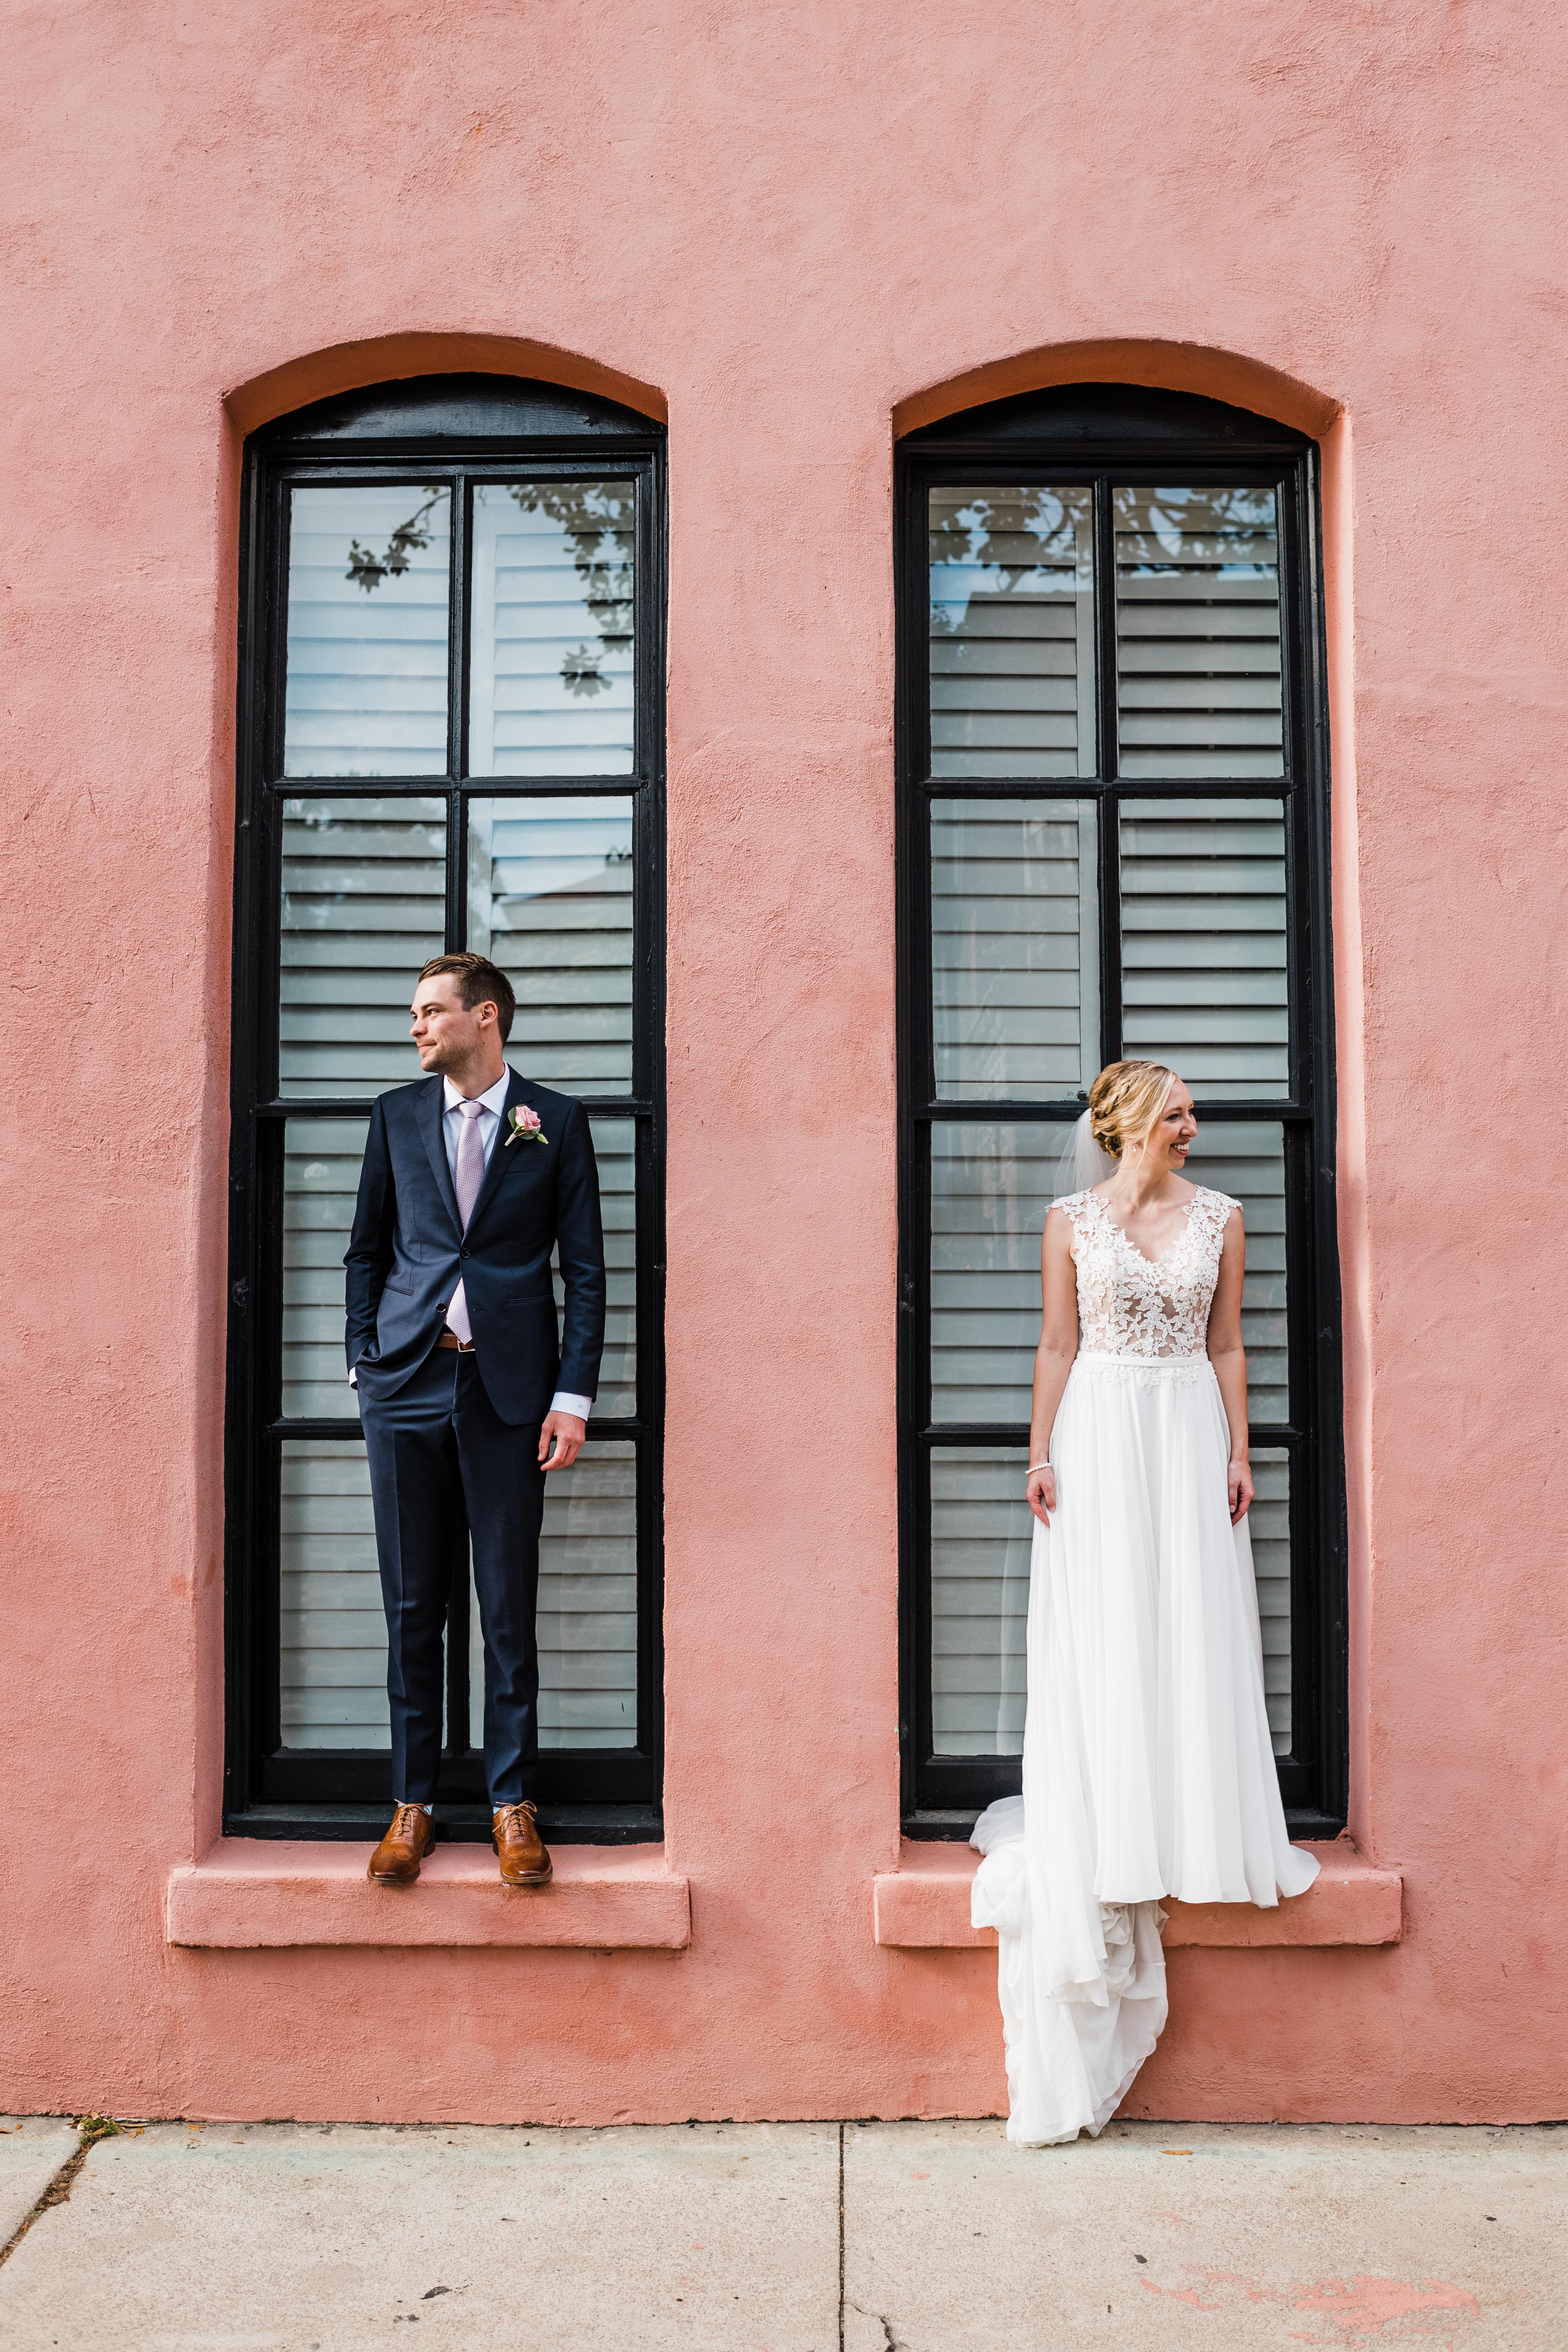 Easterday Creative | Adventurous wedding photographer and visual storyteller | Wedding photography | Charleston, SC